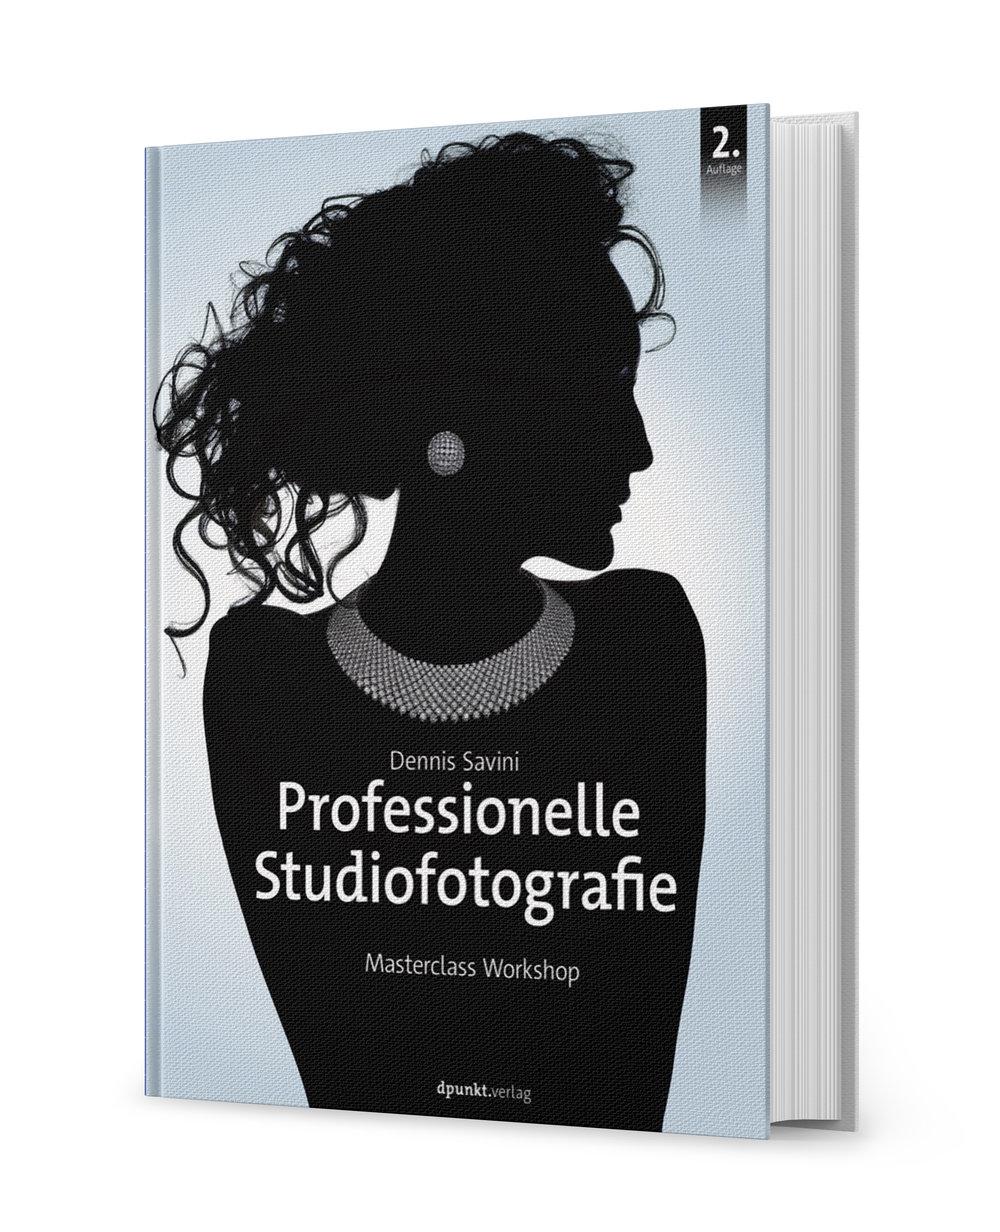 Professionelle Studiofotografie Masterclass Dennis Savini.jpg